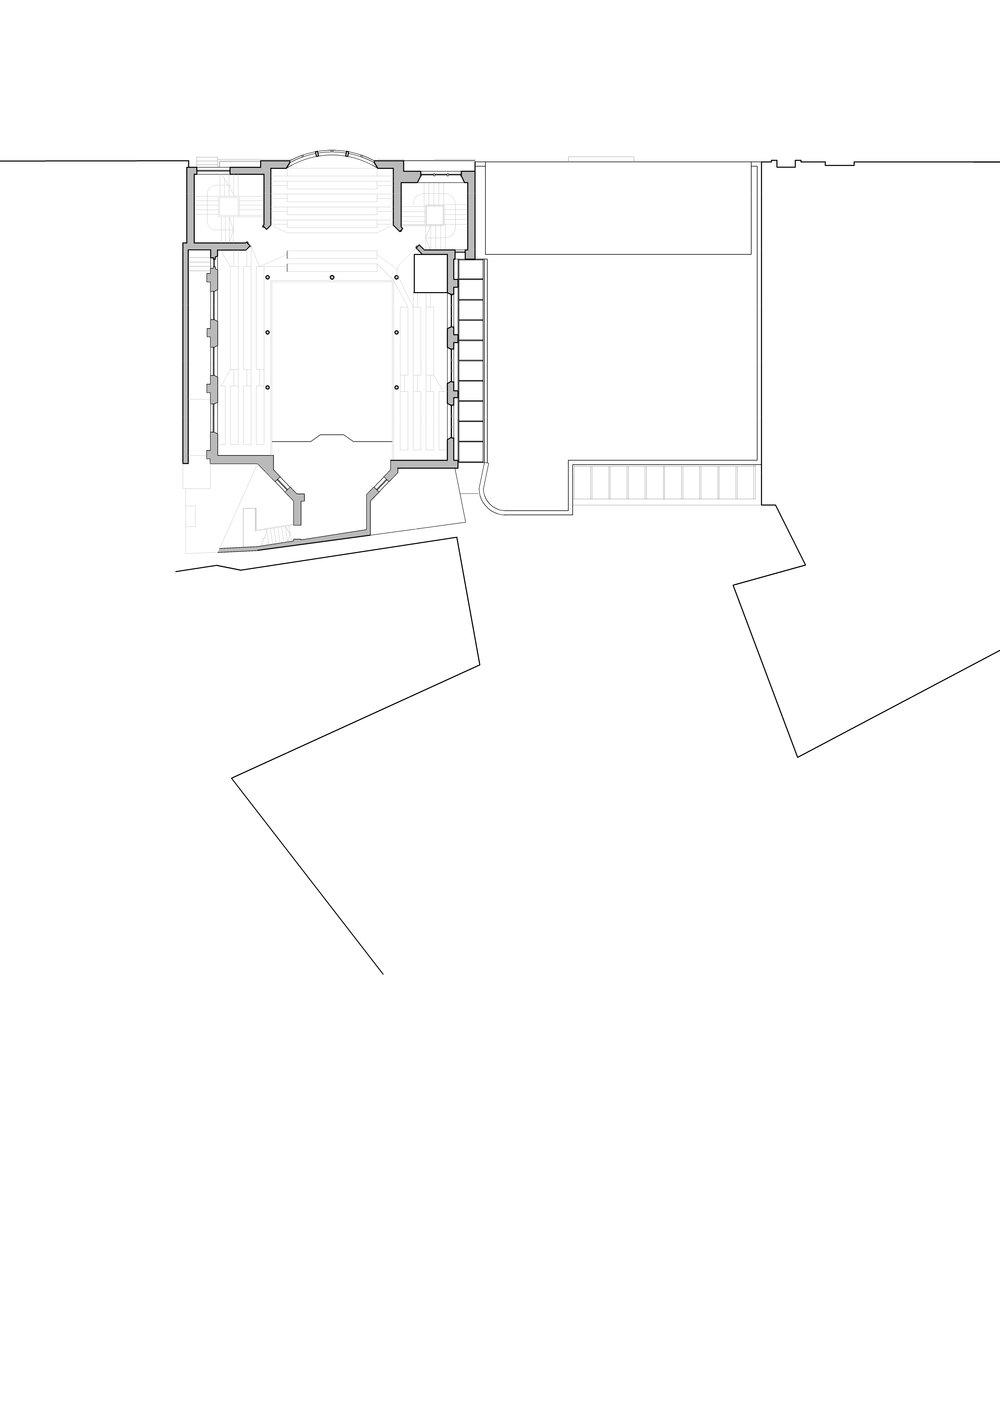 190 Dundee Baptists second floor plan 1.jpg